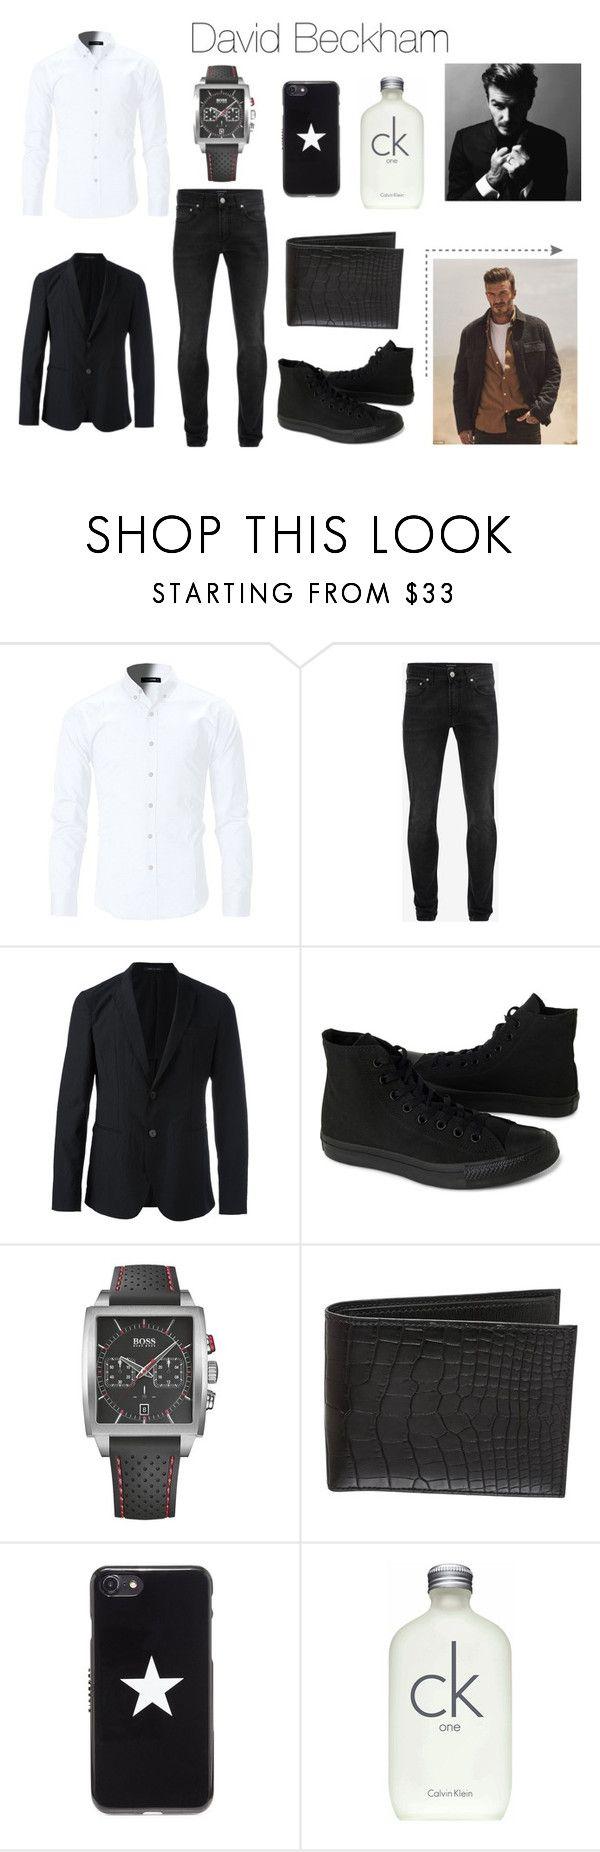 """David Beckham"" by sofifer ❤ liked on Polyvore featuring Alexander McQueen, Emporio Armani, Converse, HUGO, Hermès, Givenchy, Calvin Klein, David Beckham, men's fashion and menswear"